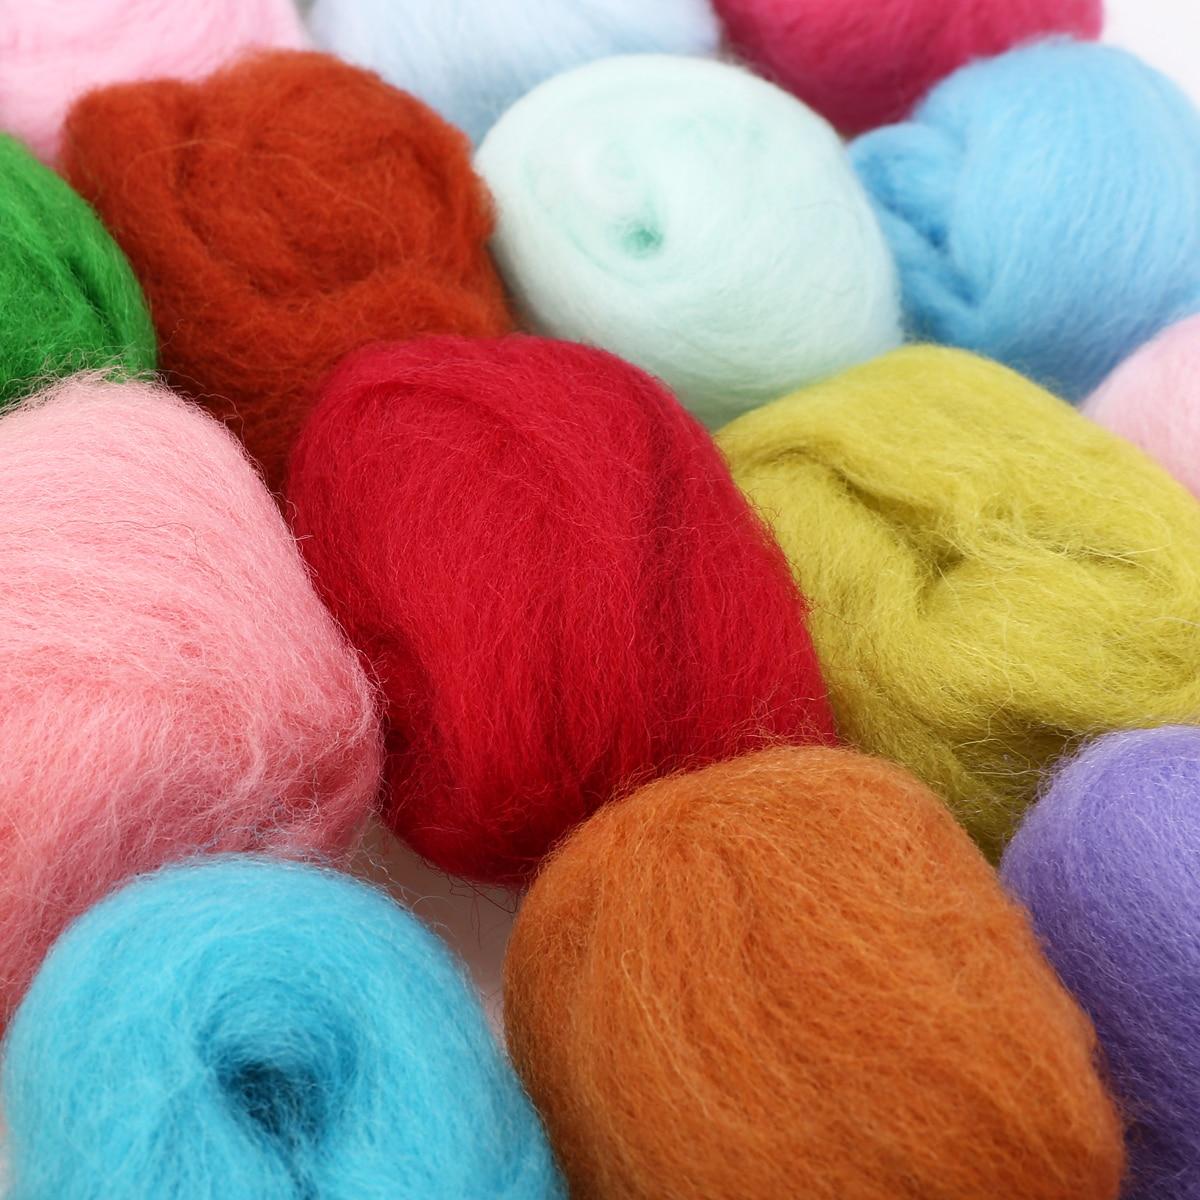 40 Colors 5g/bag Merino Wool Tops Felting Fibre For Needle Felting Wet Felting DIY Fun Doll Needlework Raw Wool Felt